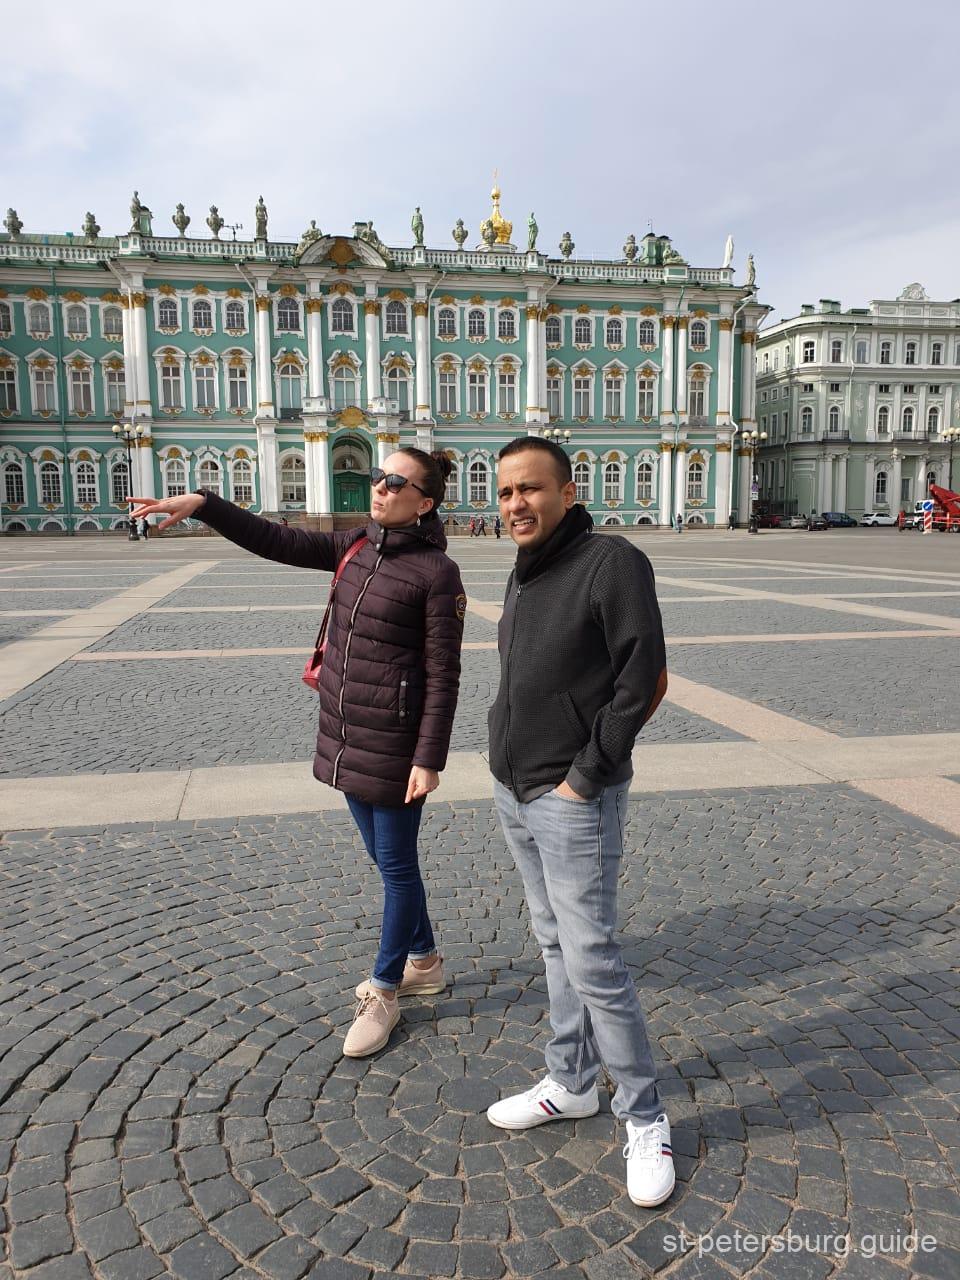 gaplichnaya guide providing city tour